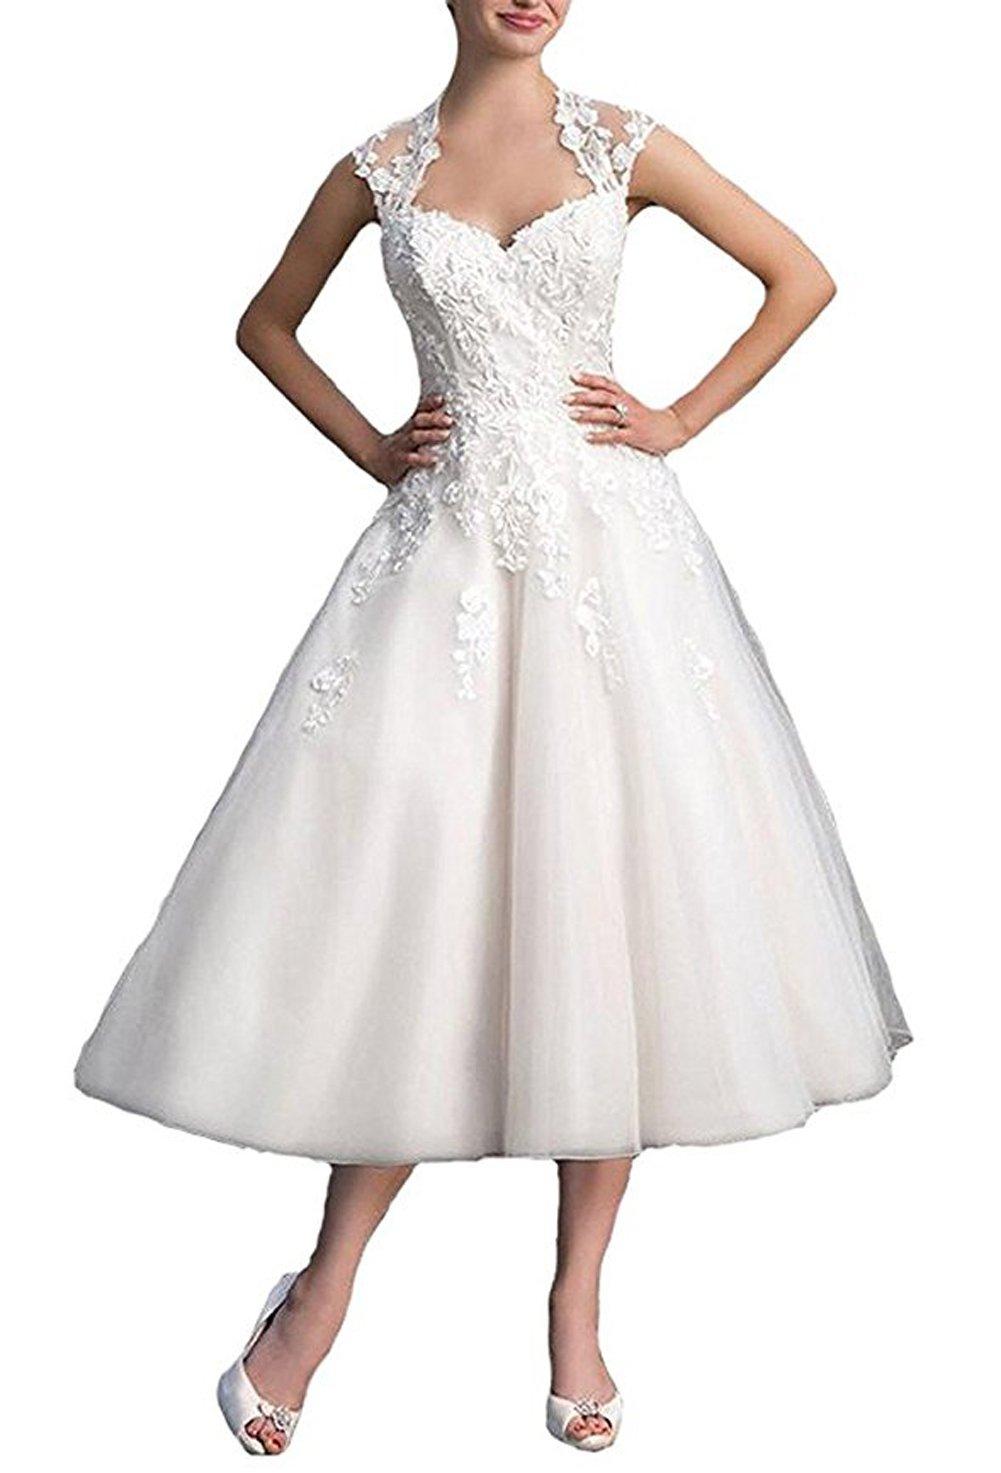 Dobelove Lace Cap Sleeves Tea Length Ball Gown Wedding Dress